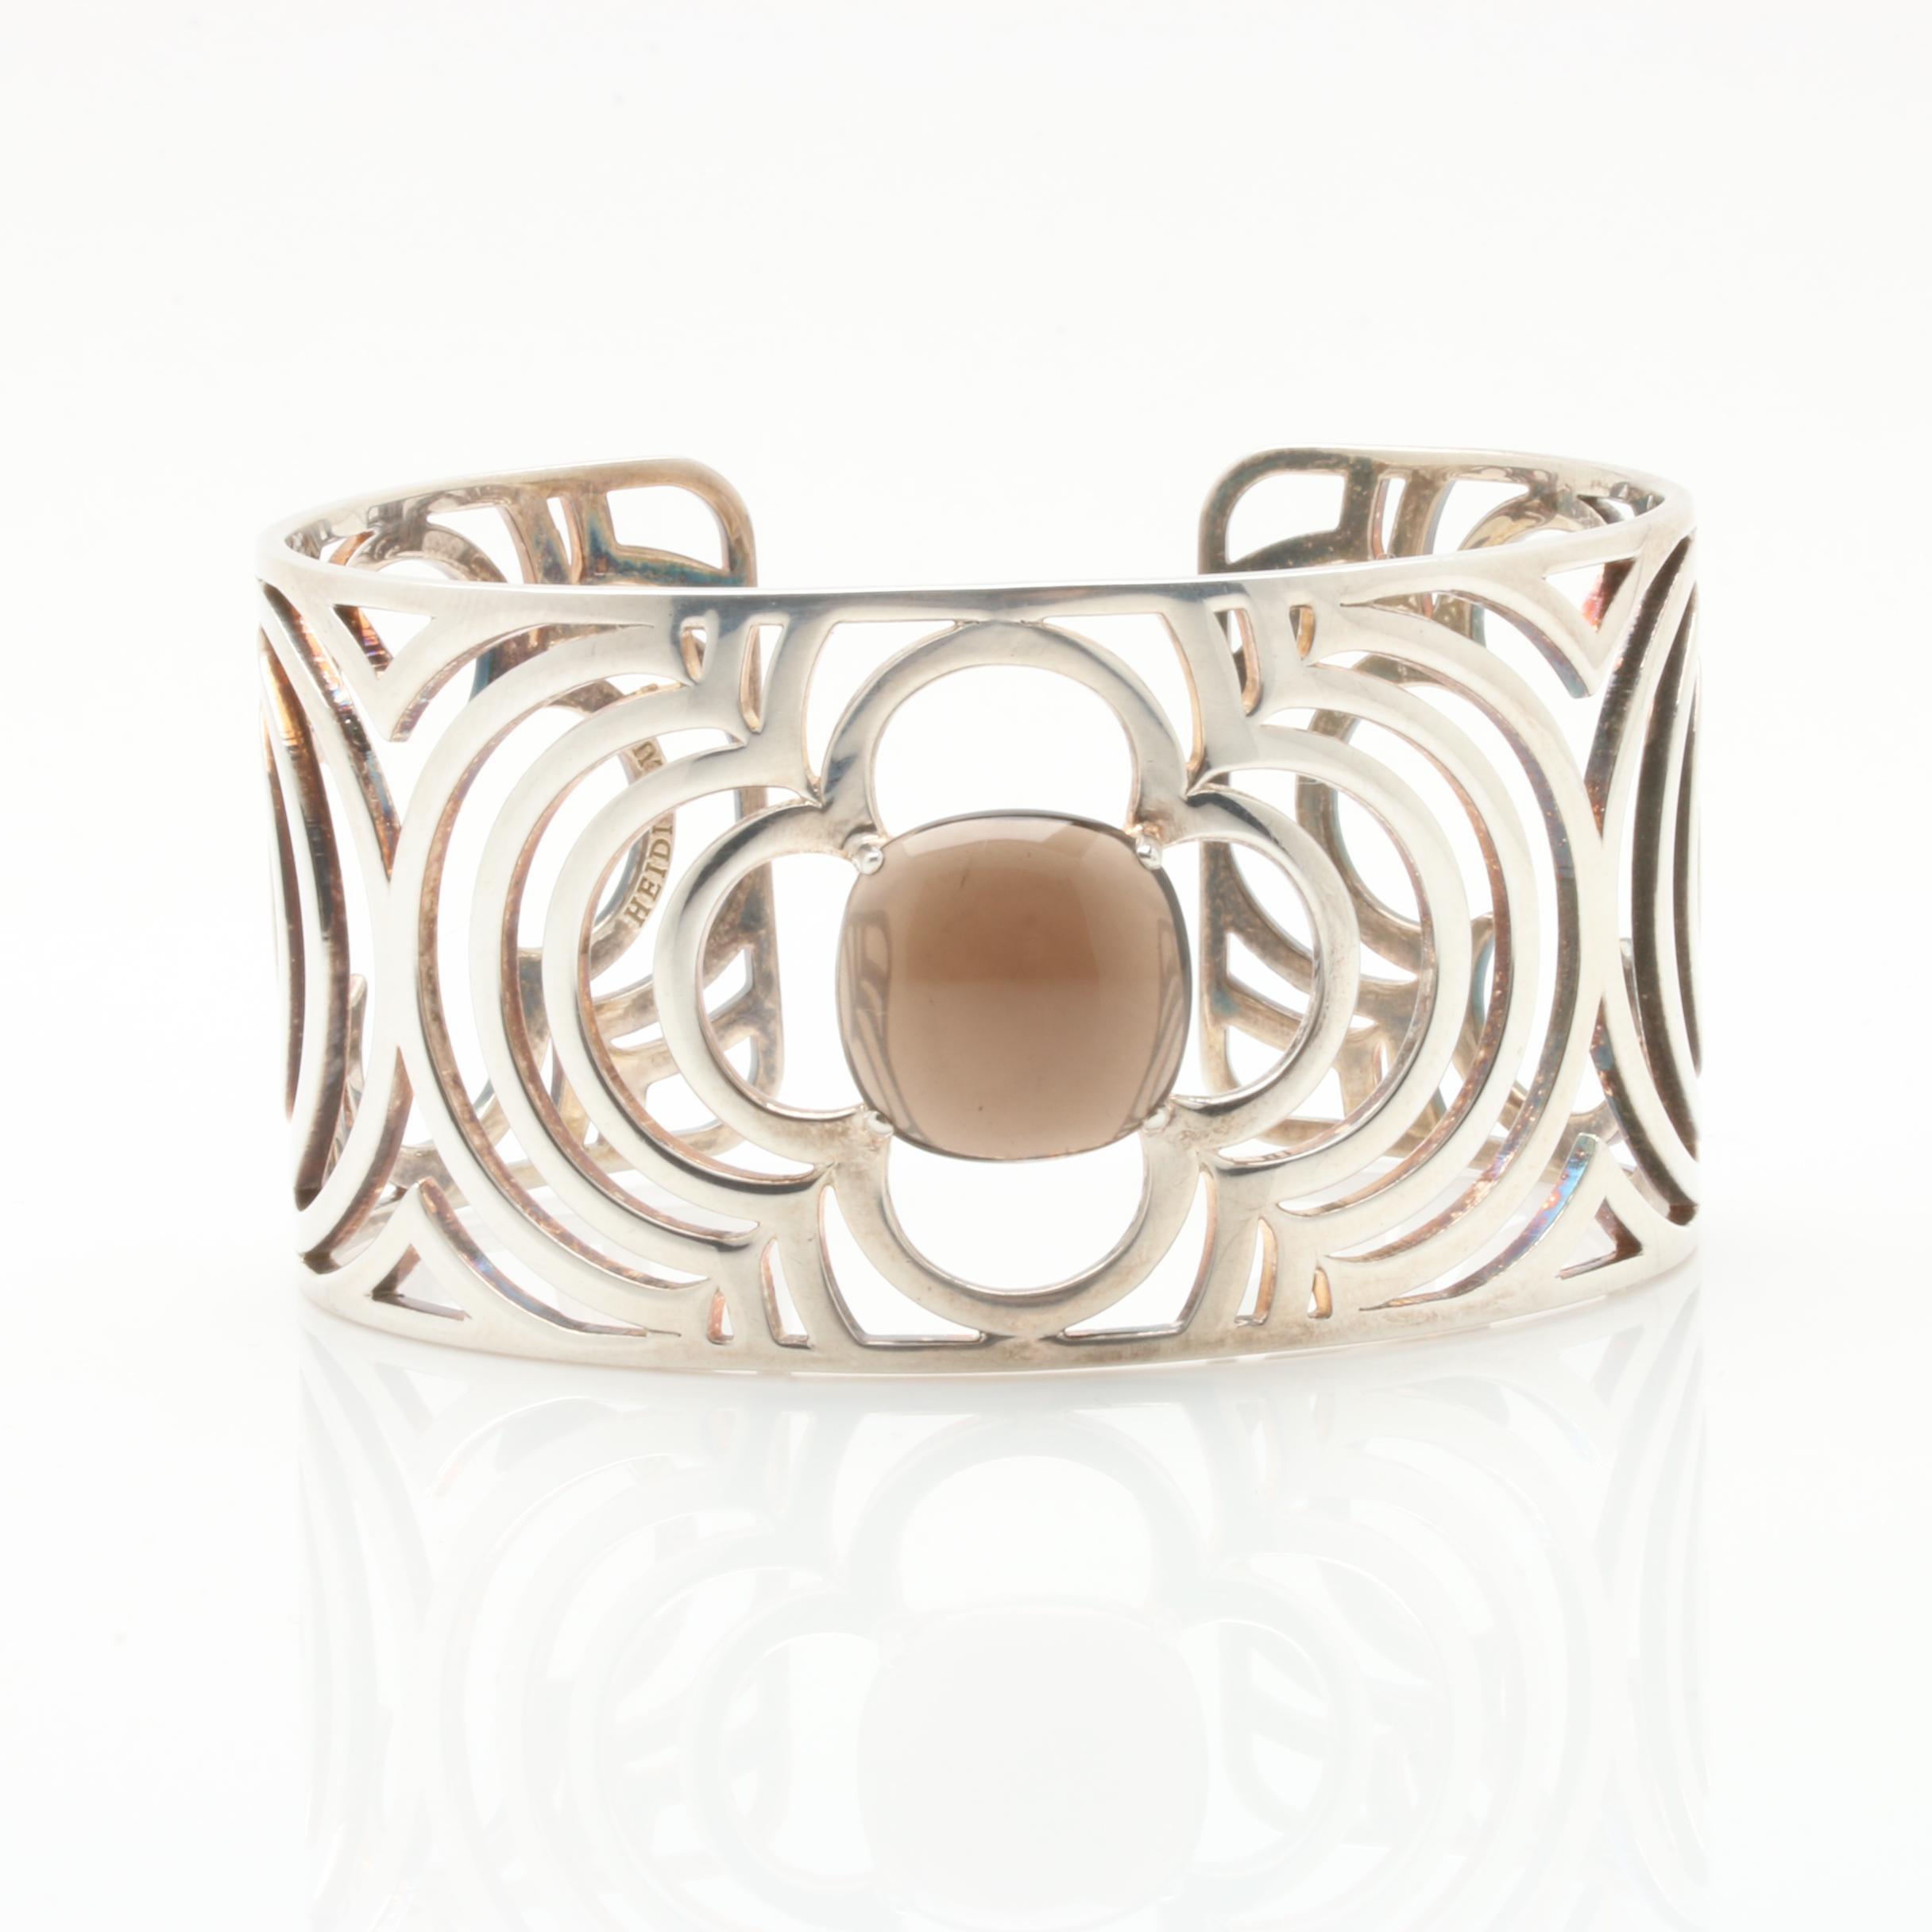 Heidi Klum Sterling Silver Smoky Quartz Cuff Bracelet